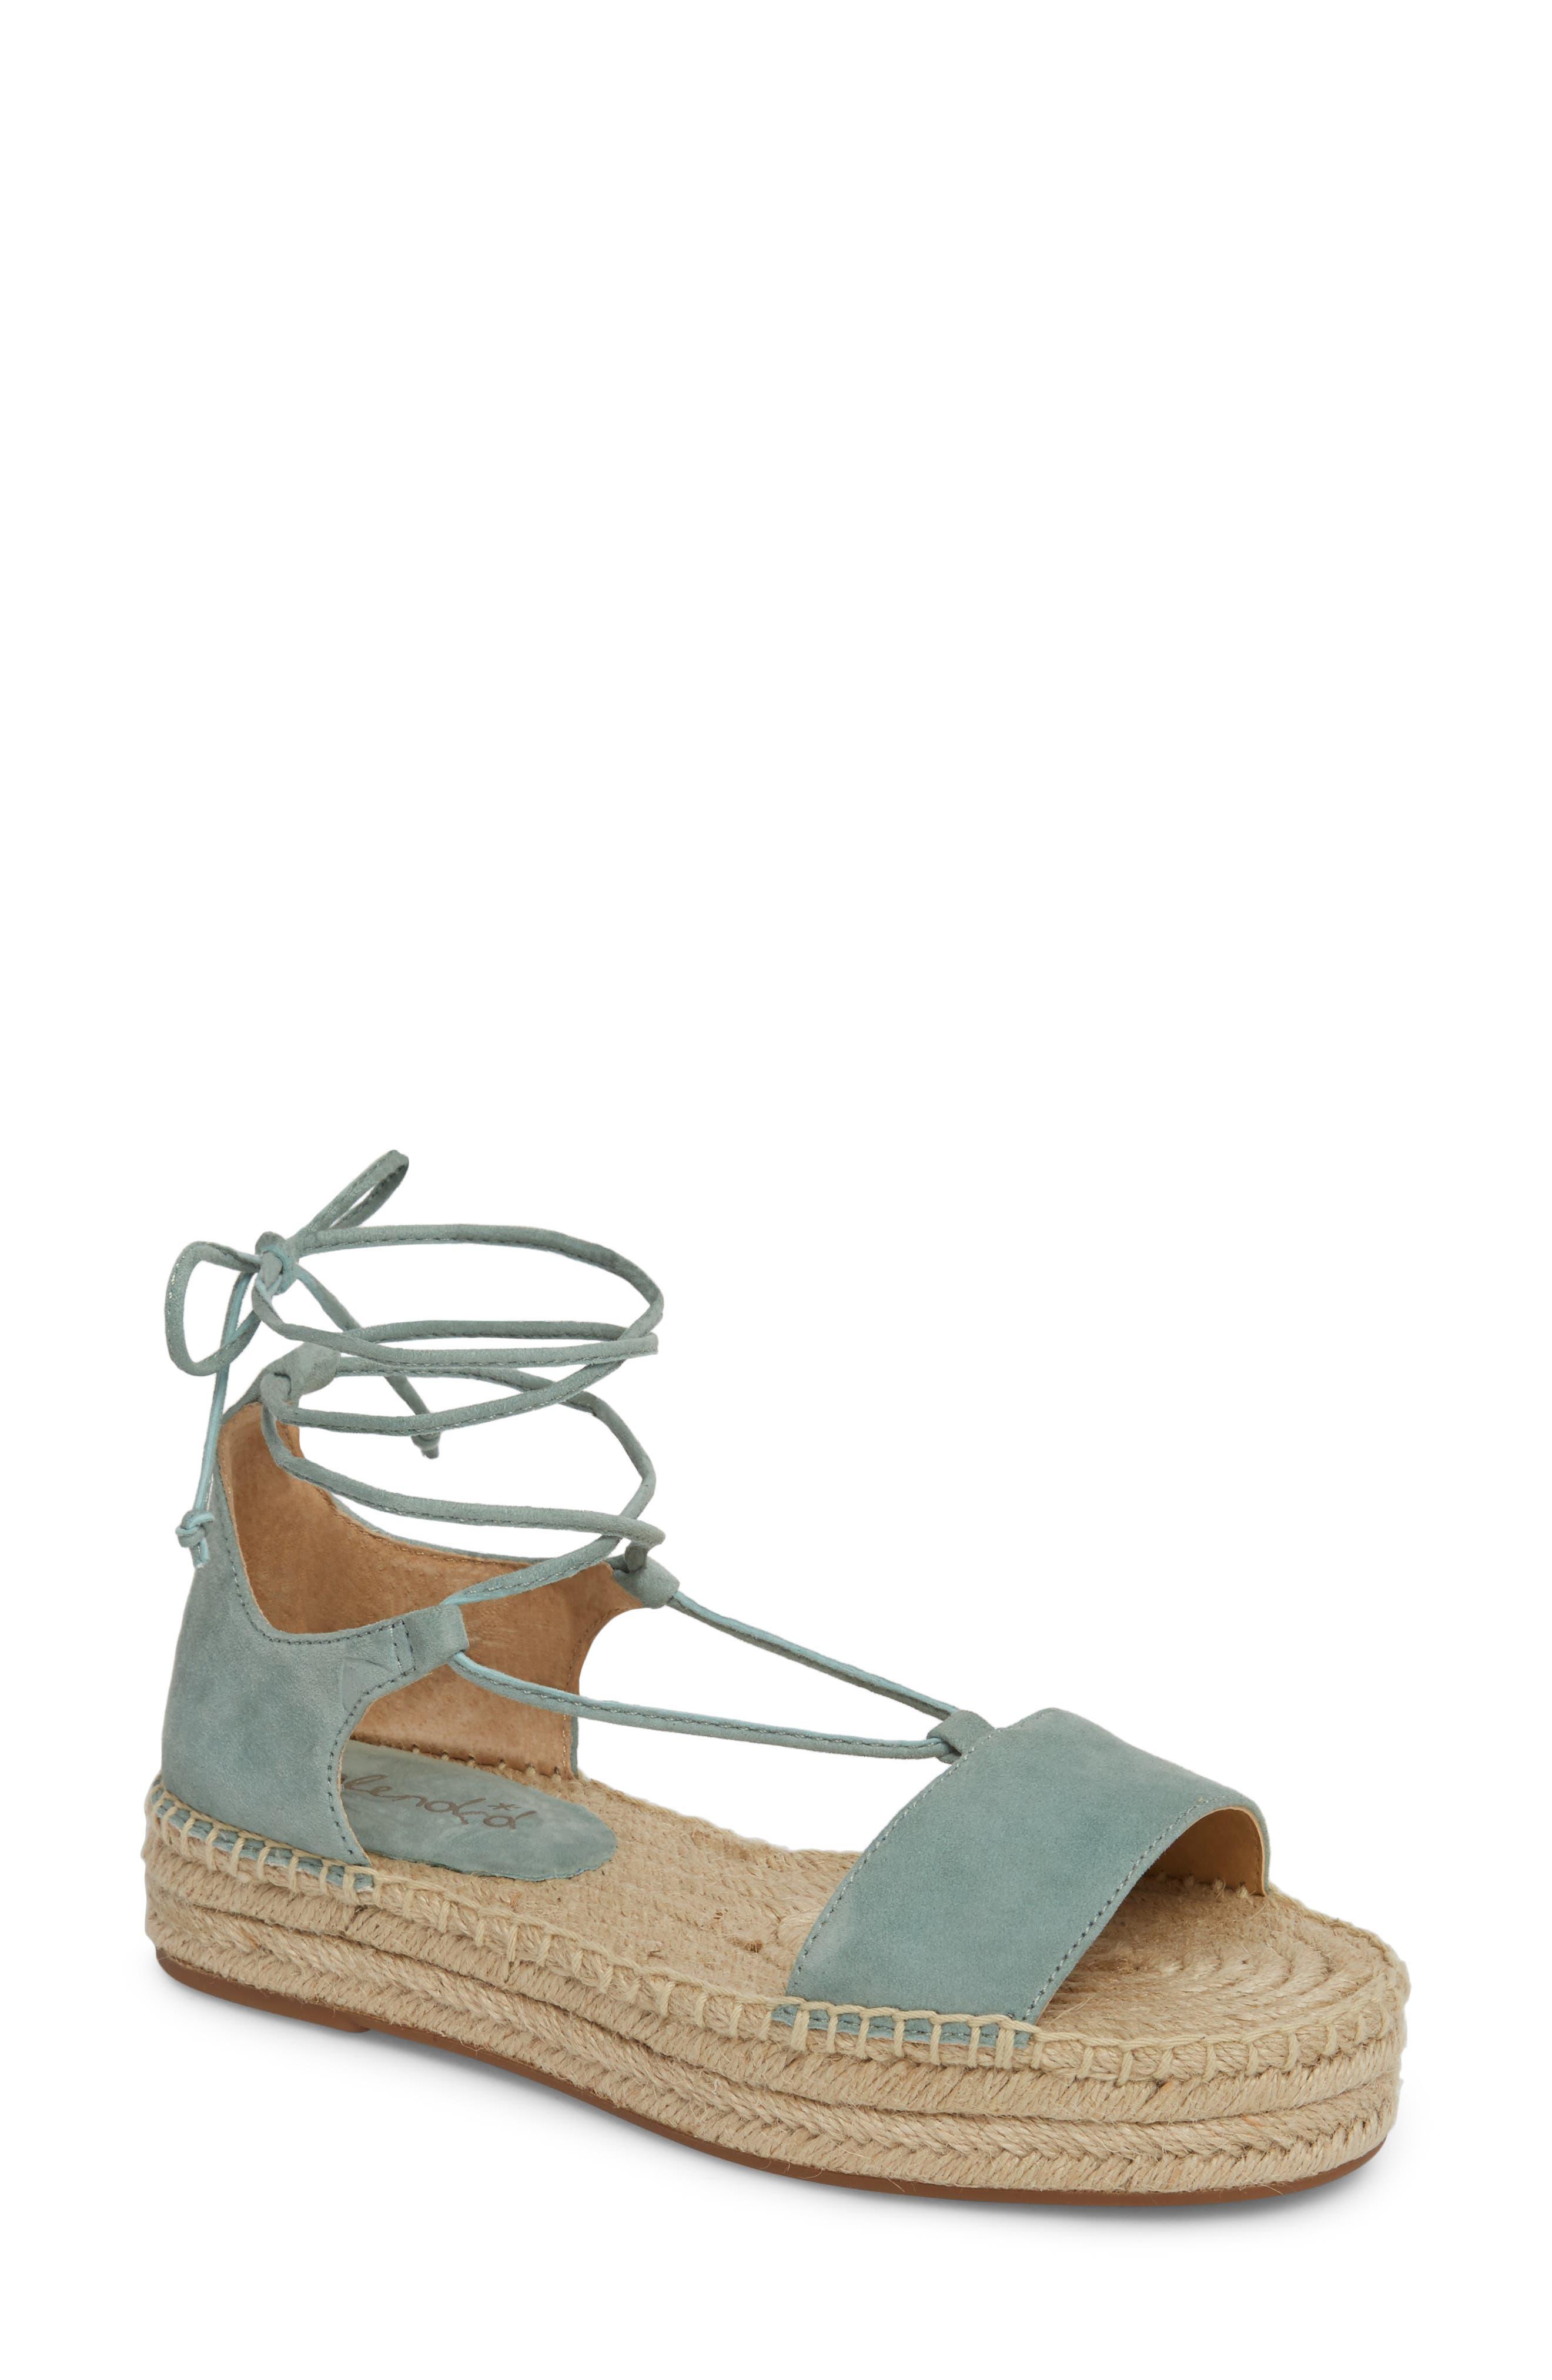 Fernanda Wraparound Platform Sandal,                             Main thumbnail 1, color,                             Deco Green Suede